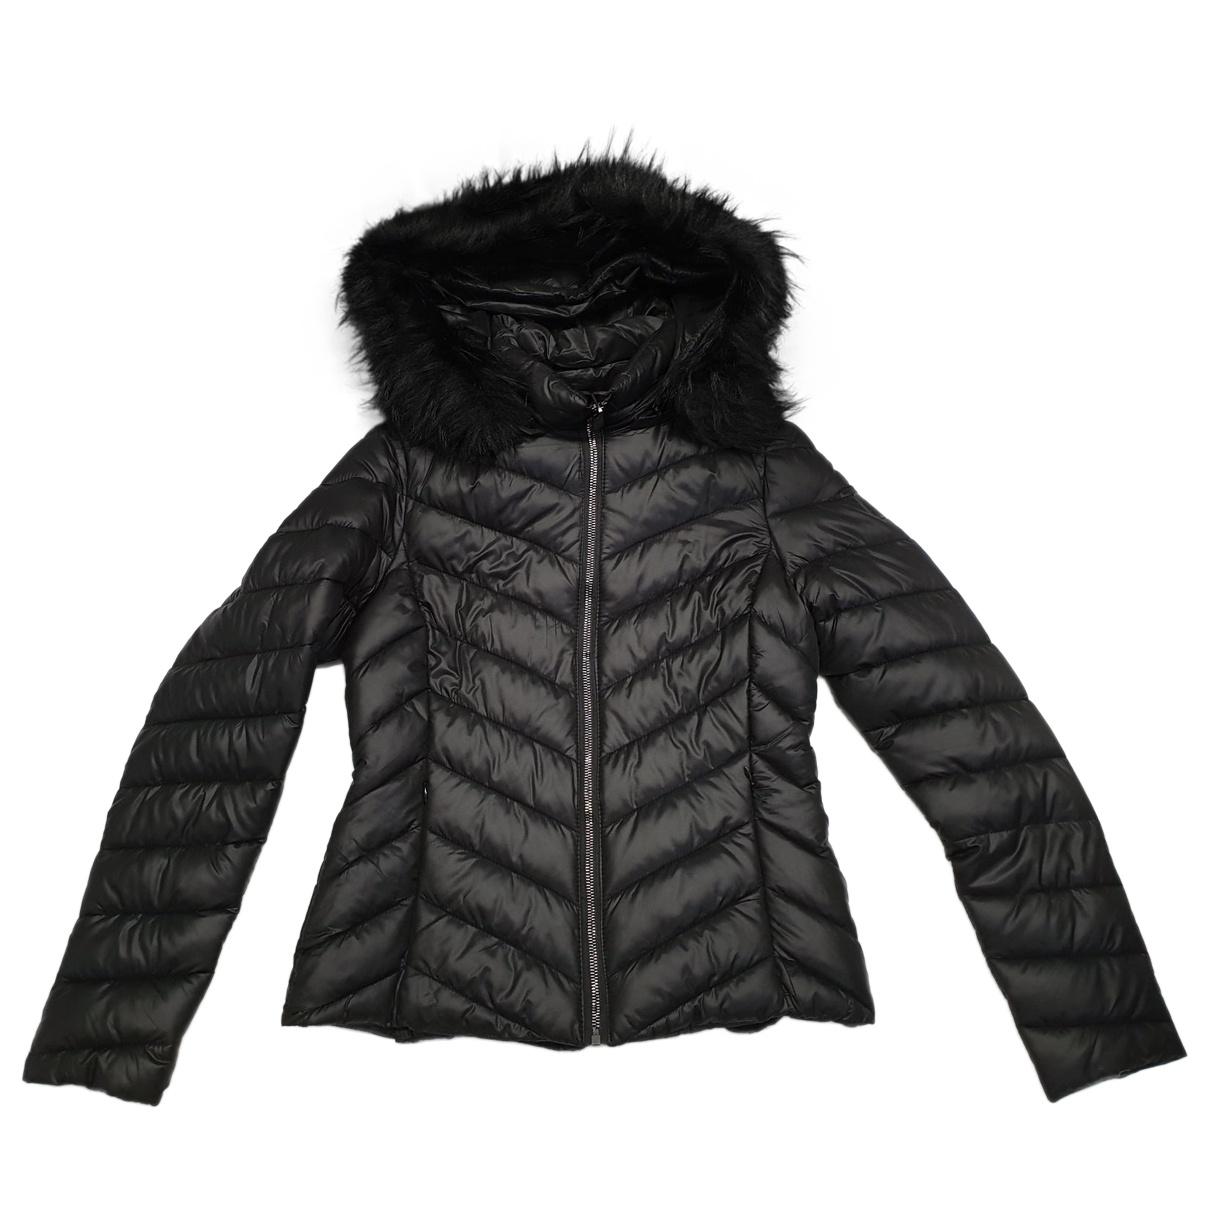 Trussardi \N Black jacket for Women S International